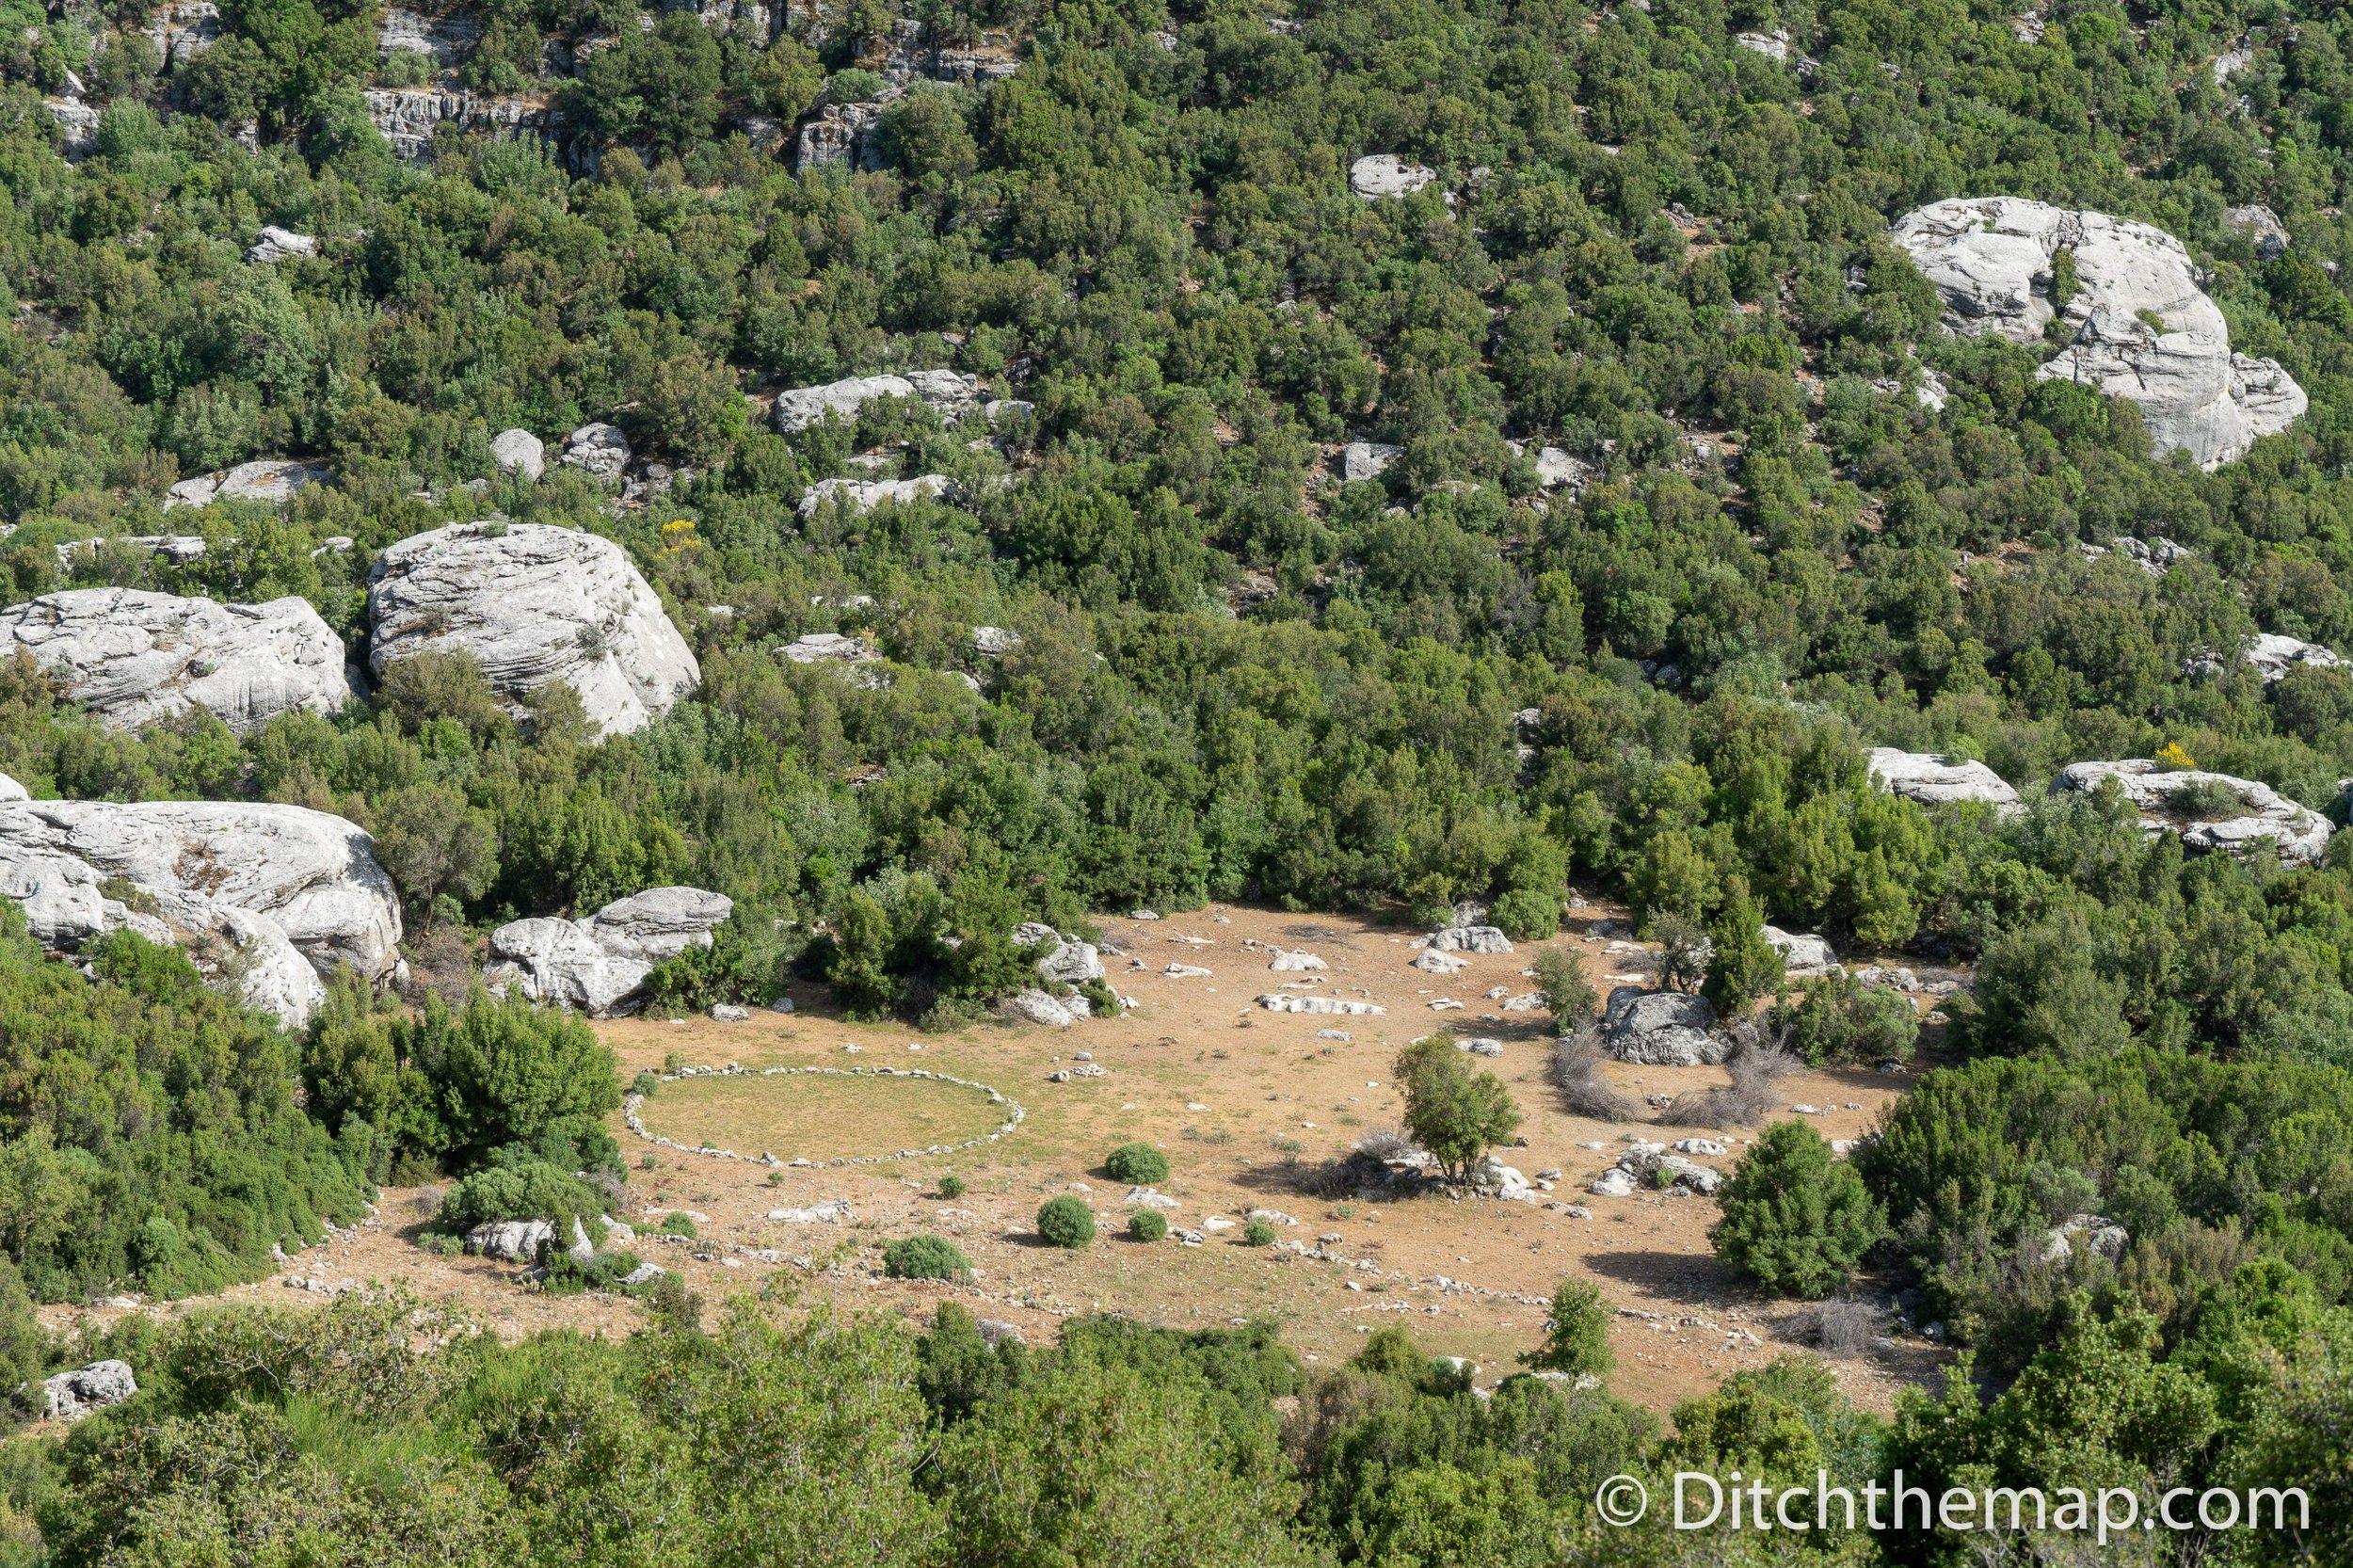 An inviting grassy clearing on the Lycian Way between Saribelen and Gökçeören